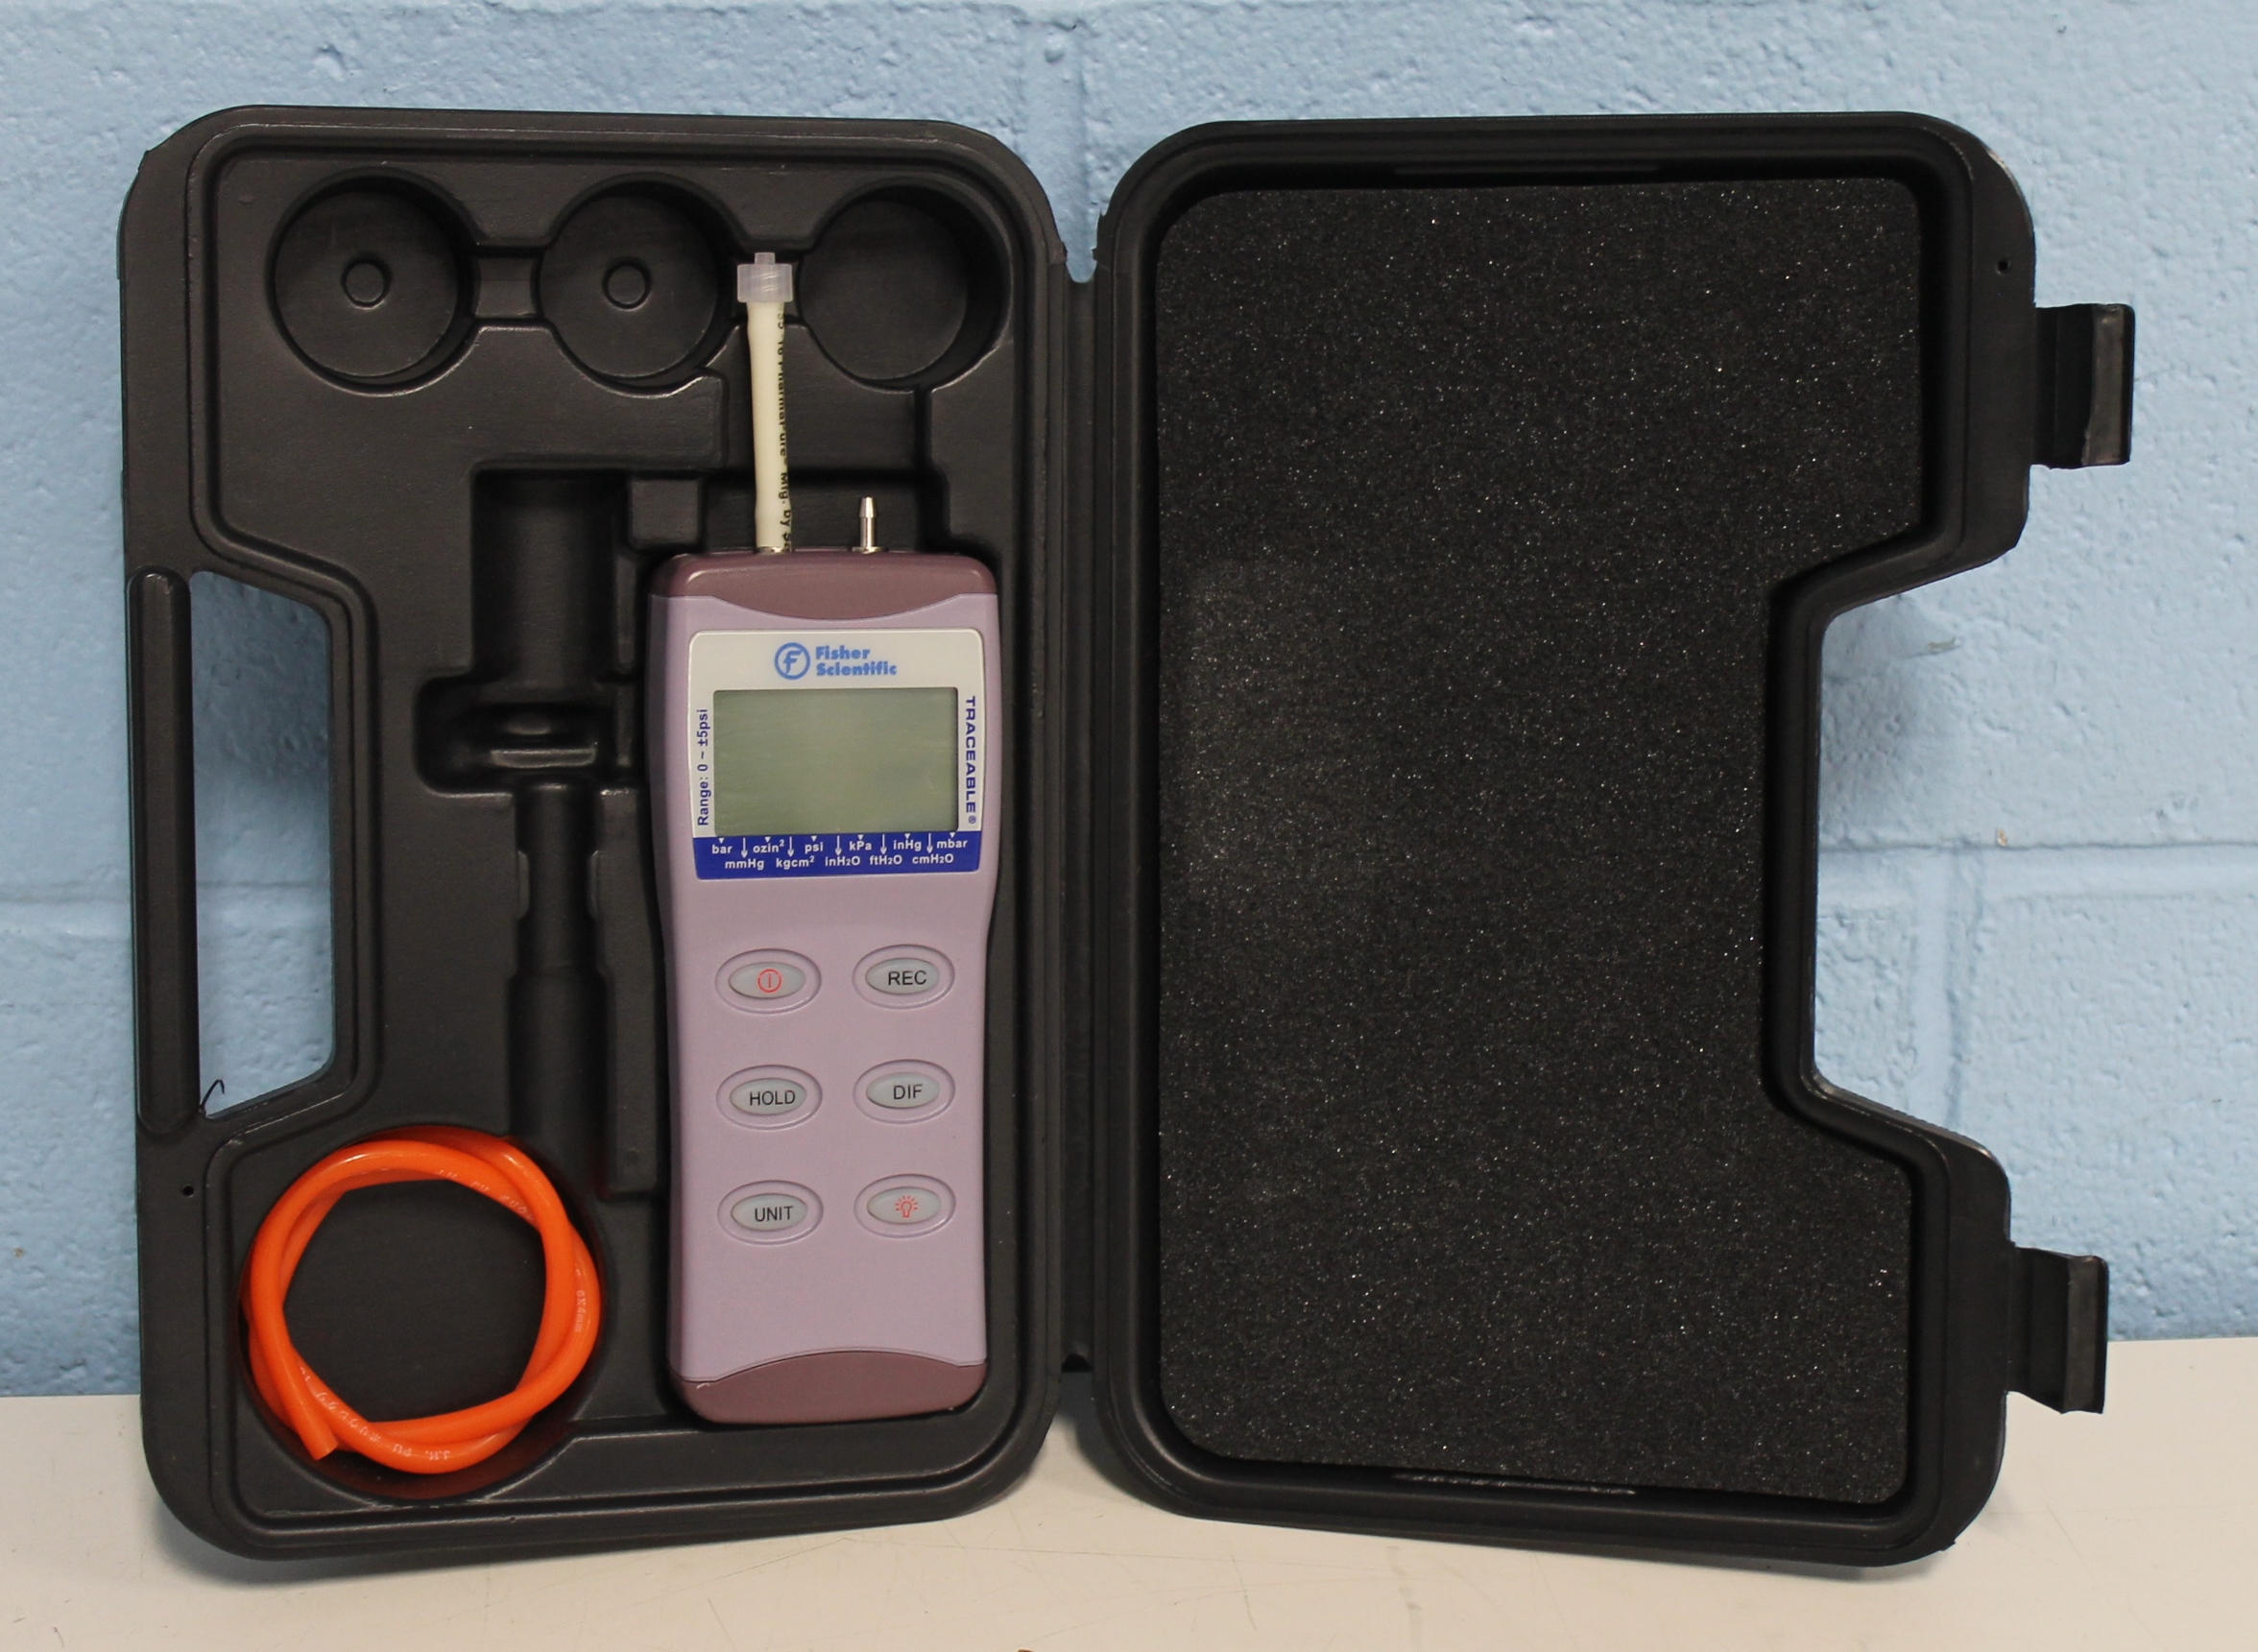 Refurbished Fisher Scientific Traceable Manometer 0-5 PSI